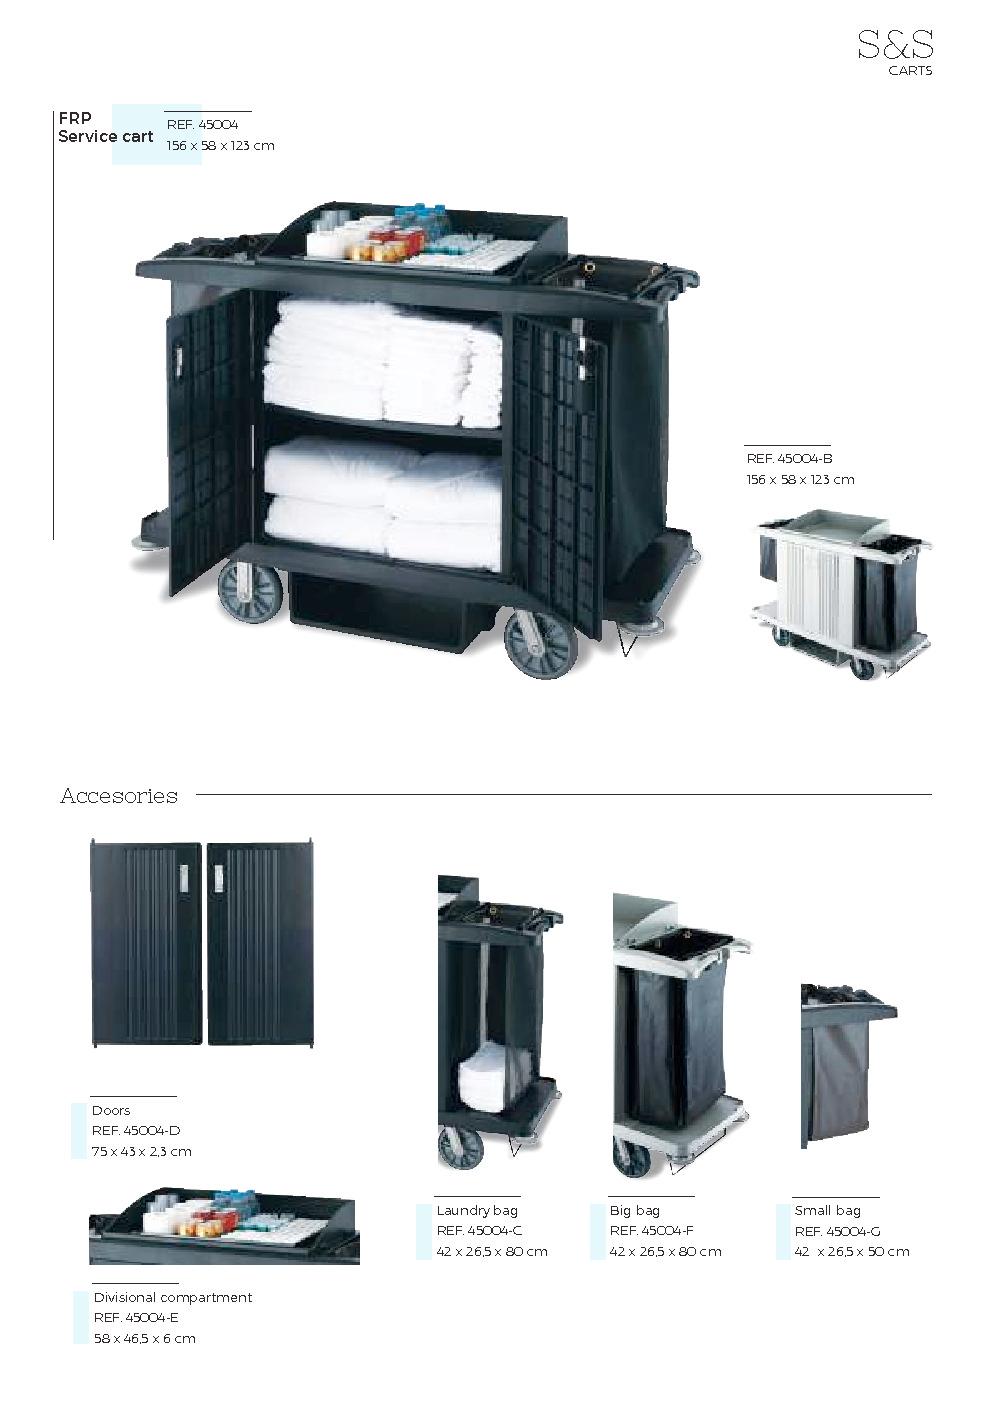 carttec-hotel-catalog-english-715-5.jpg